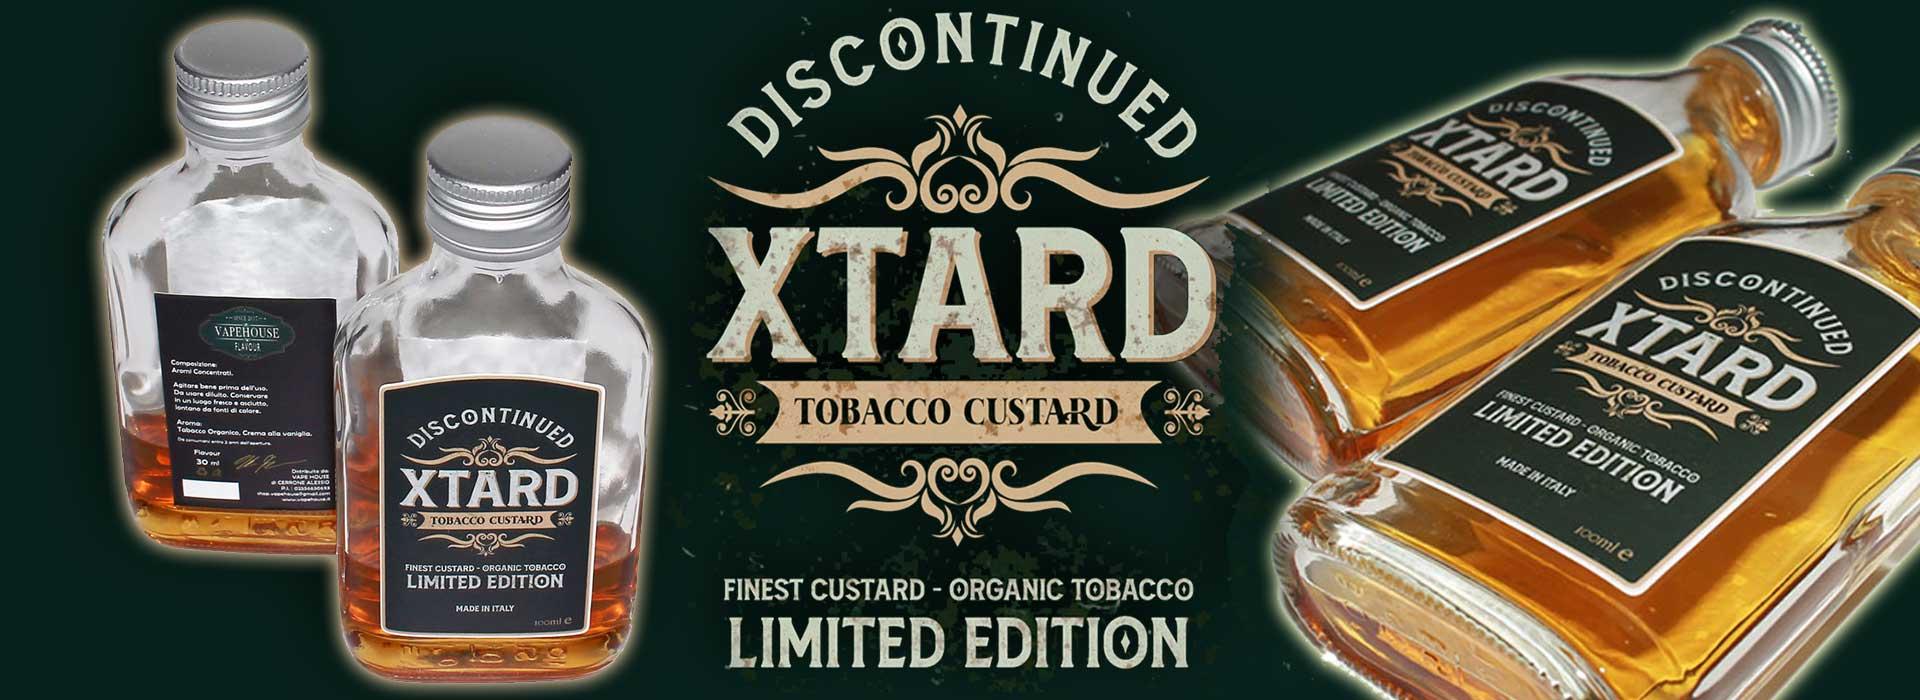 Xtard